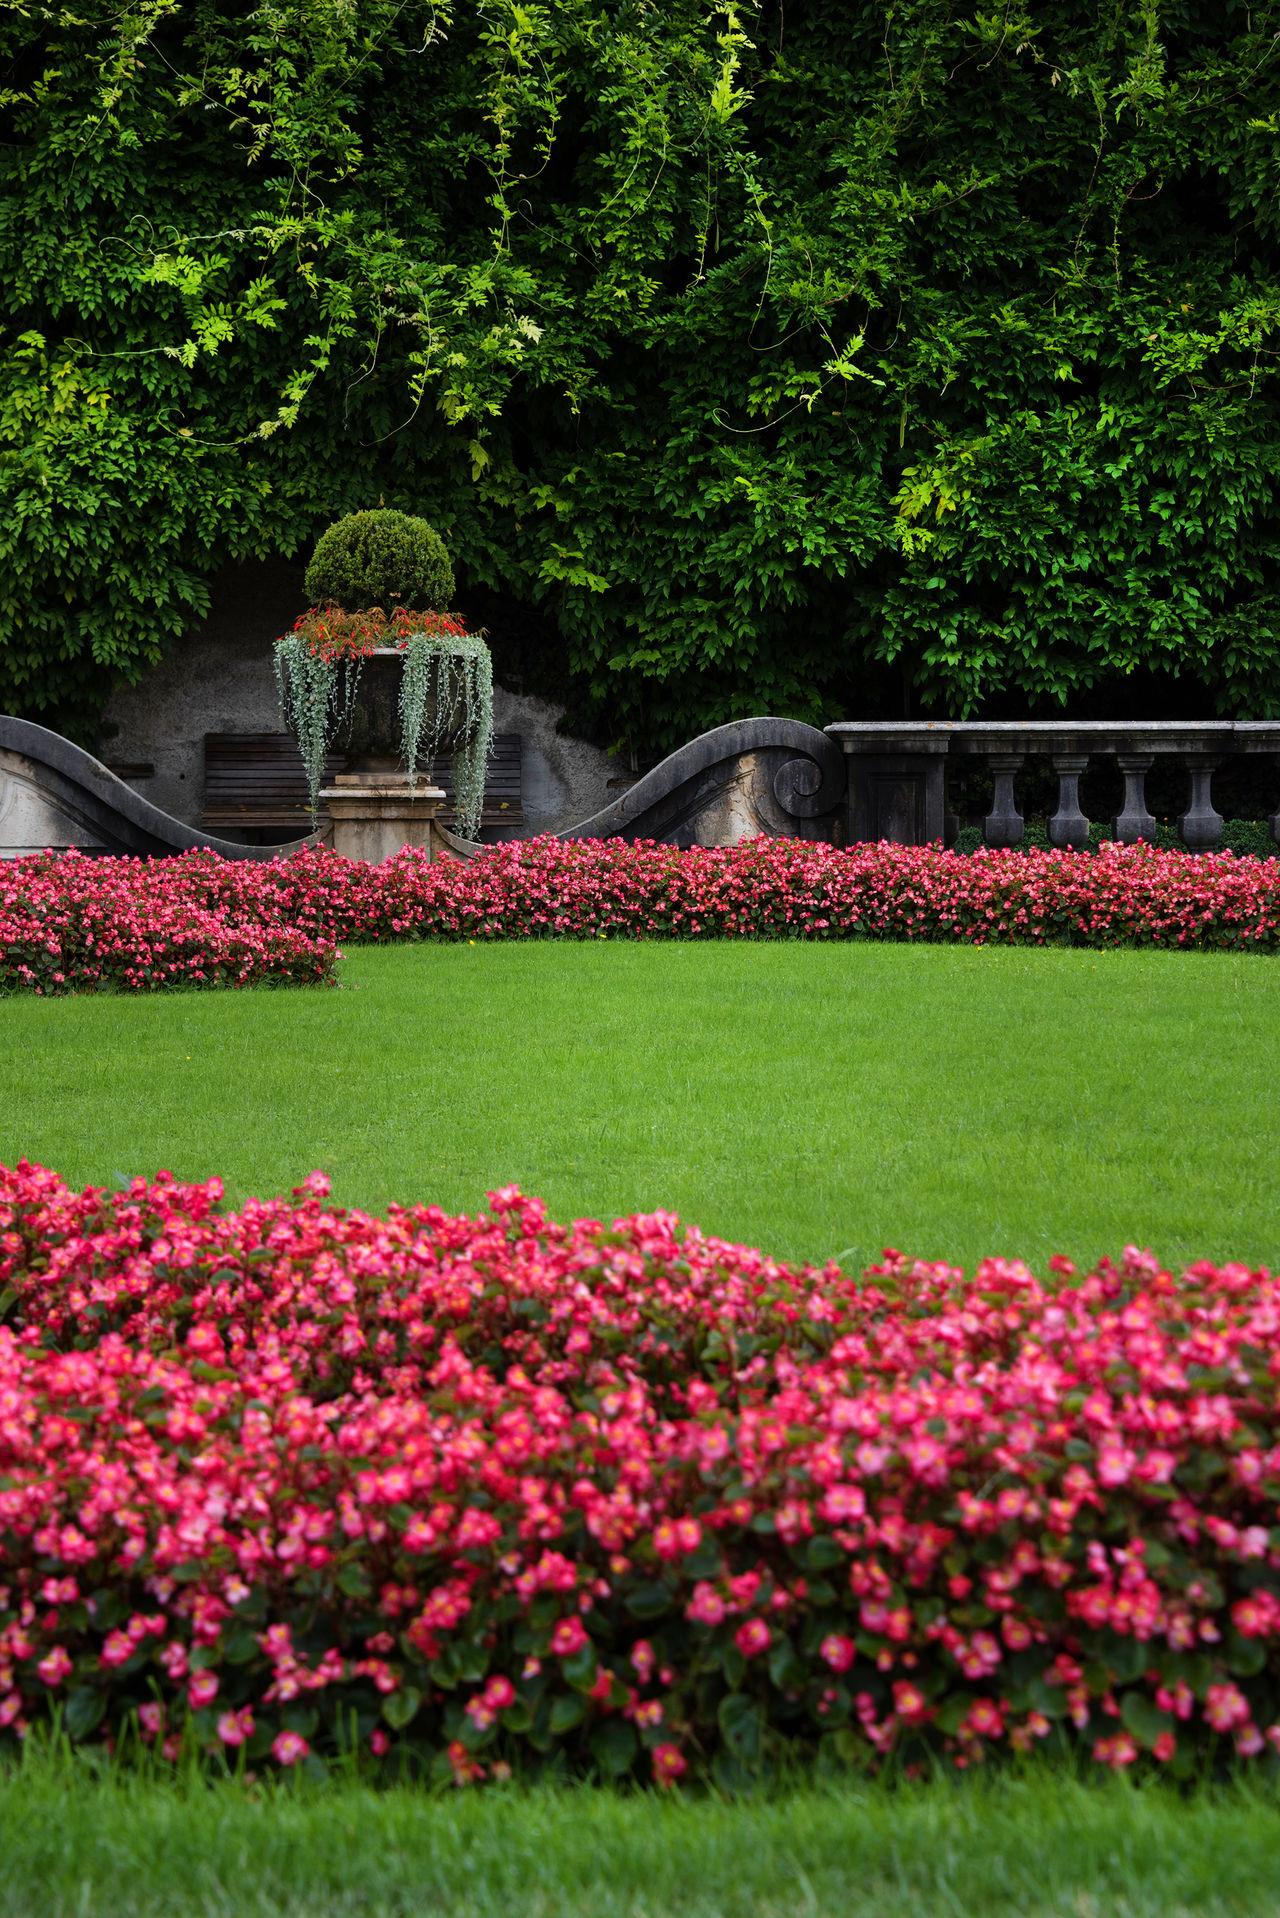 Nikon D810 Architecture Architecture_collection Europe Europe Trip European  Landmark Mozart MozartGeburthaus Mozartstadt Park Tourism Travel Travel Destinations Travel Photography